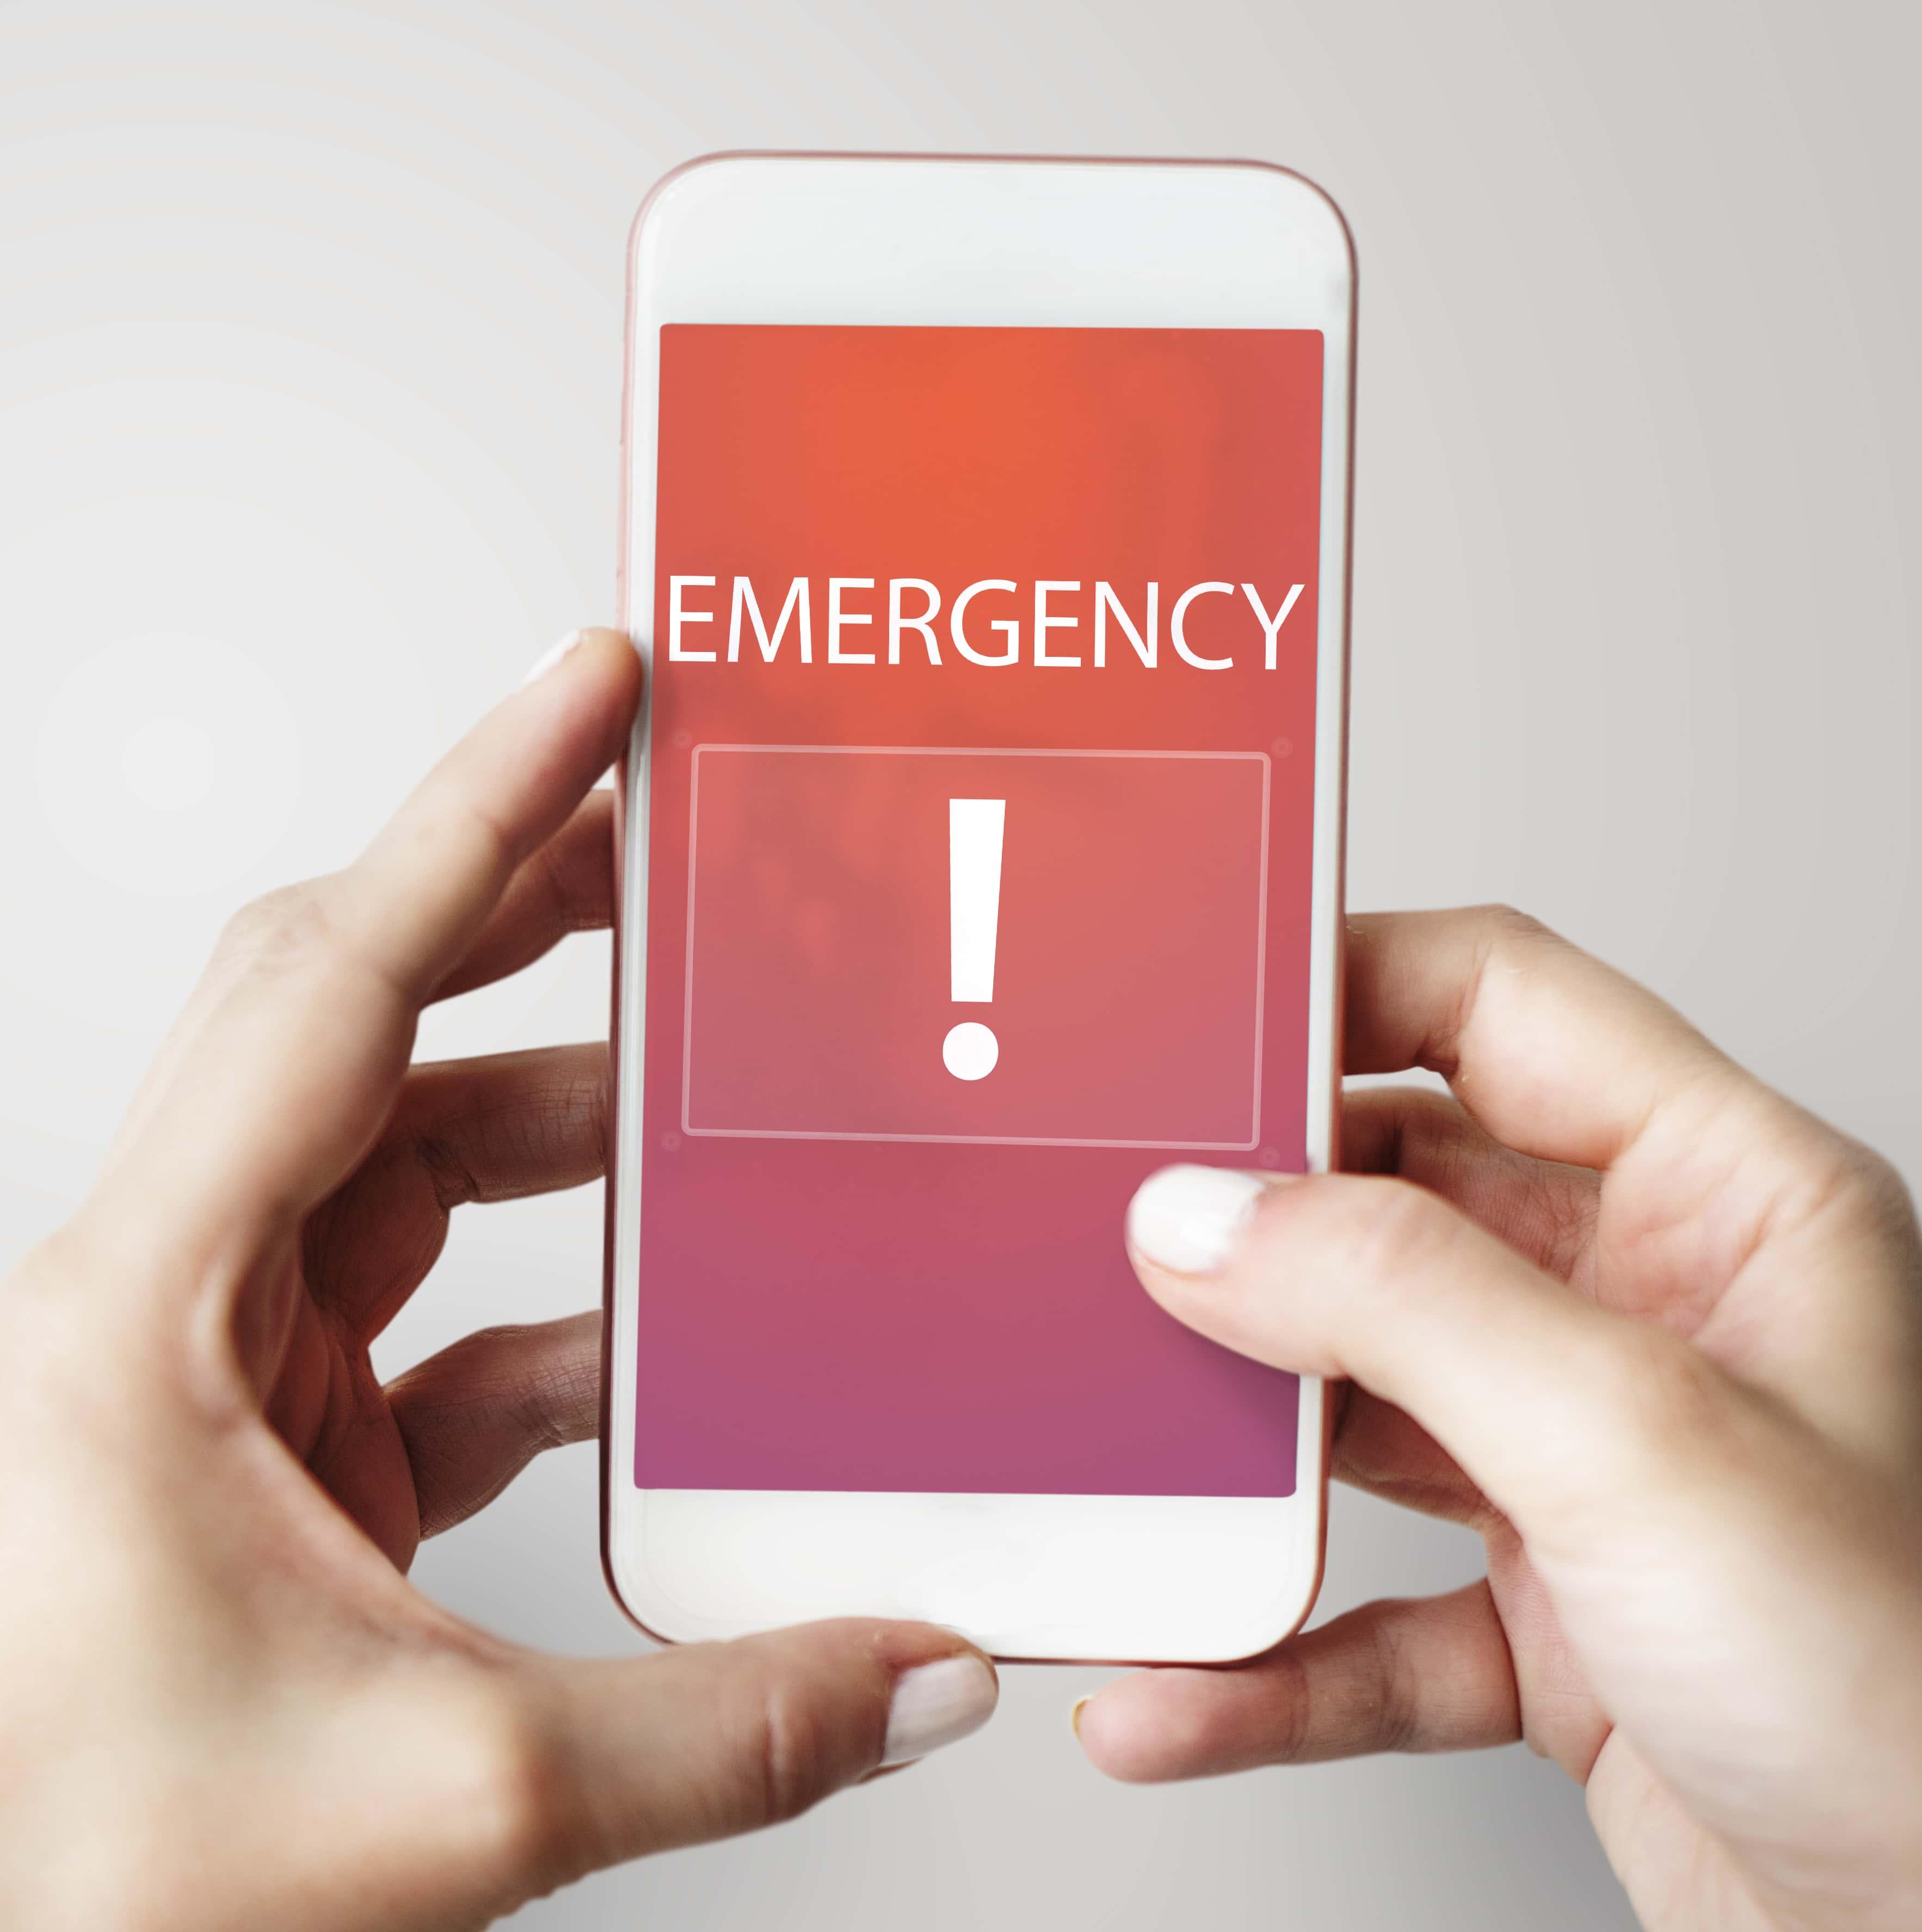 Failures of the Emergency Alert System Addressed | KSRO